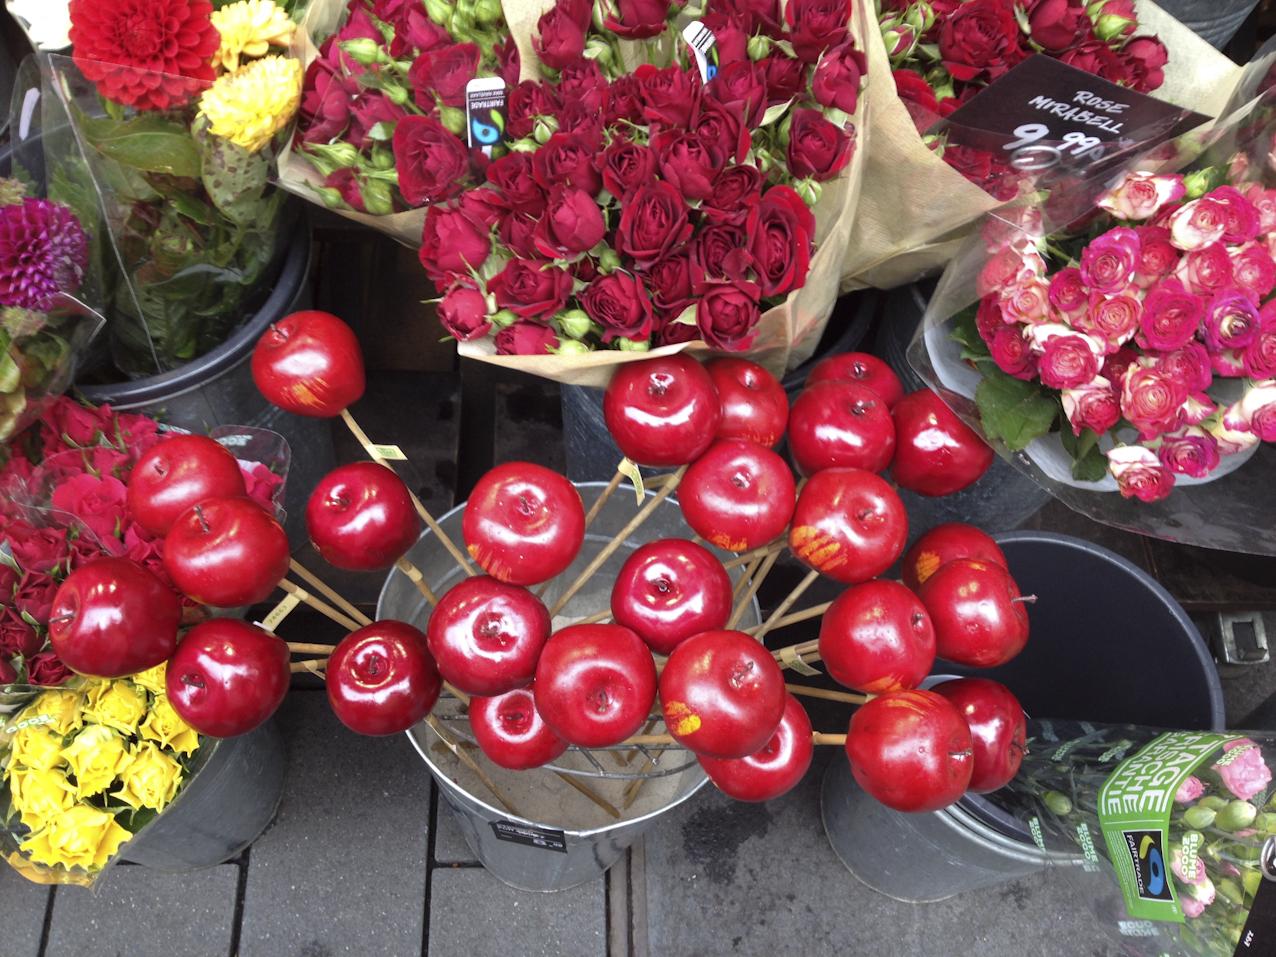 #anappleaday – 13.04.2015 – Äpfel im Blumenladen